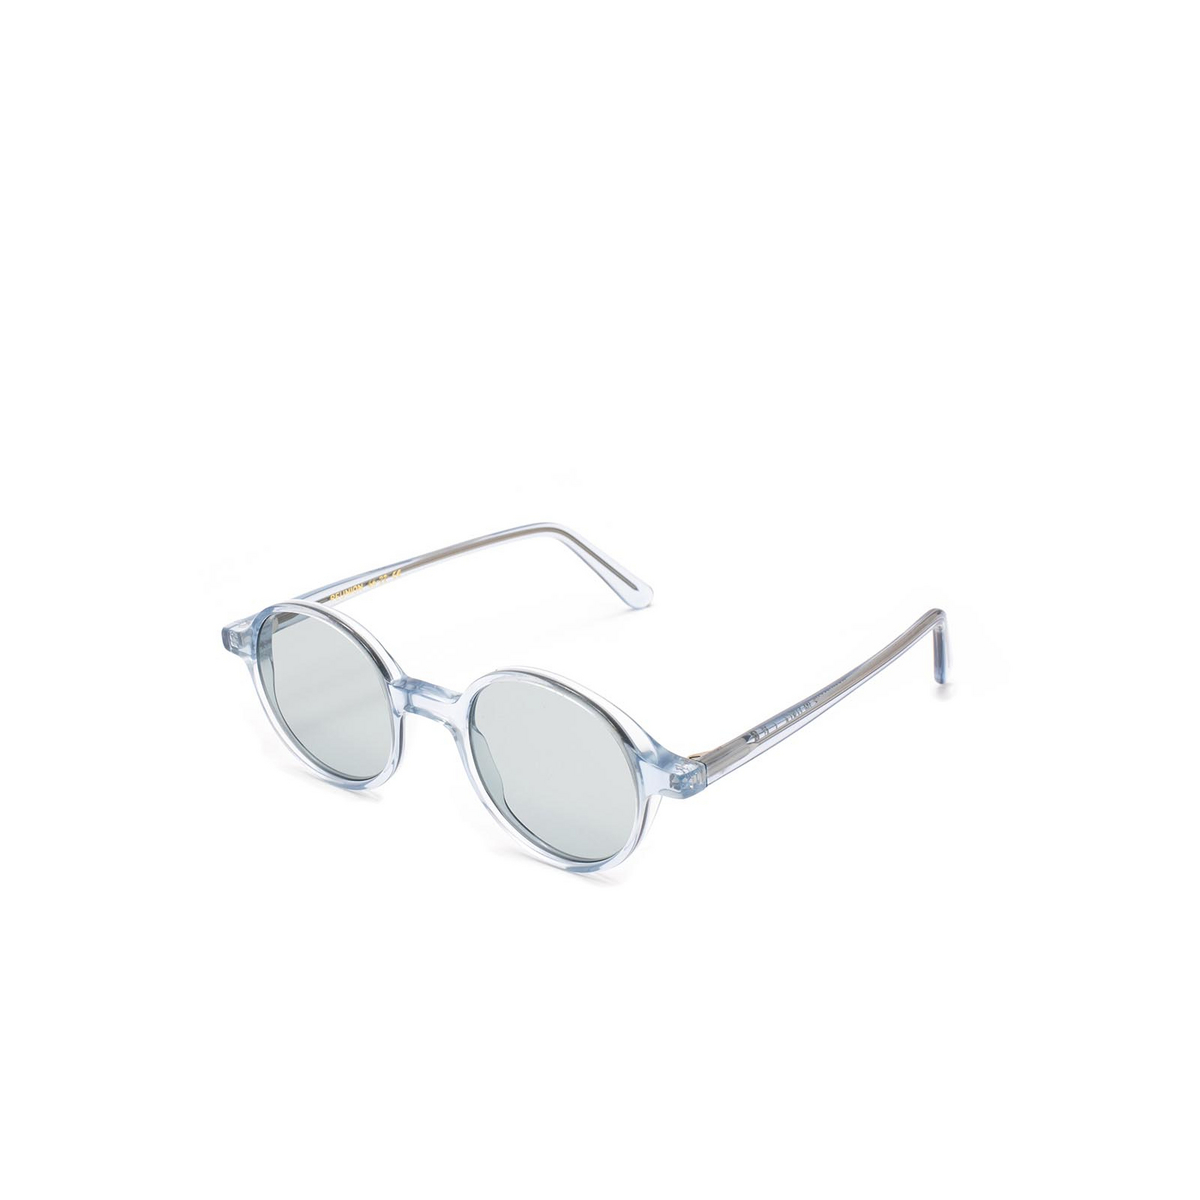 L.G.R® Round Sunglasses: Reunion color Crystal Blue 72.